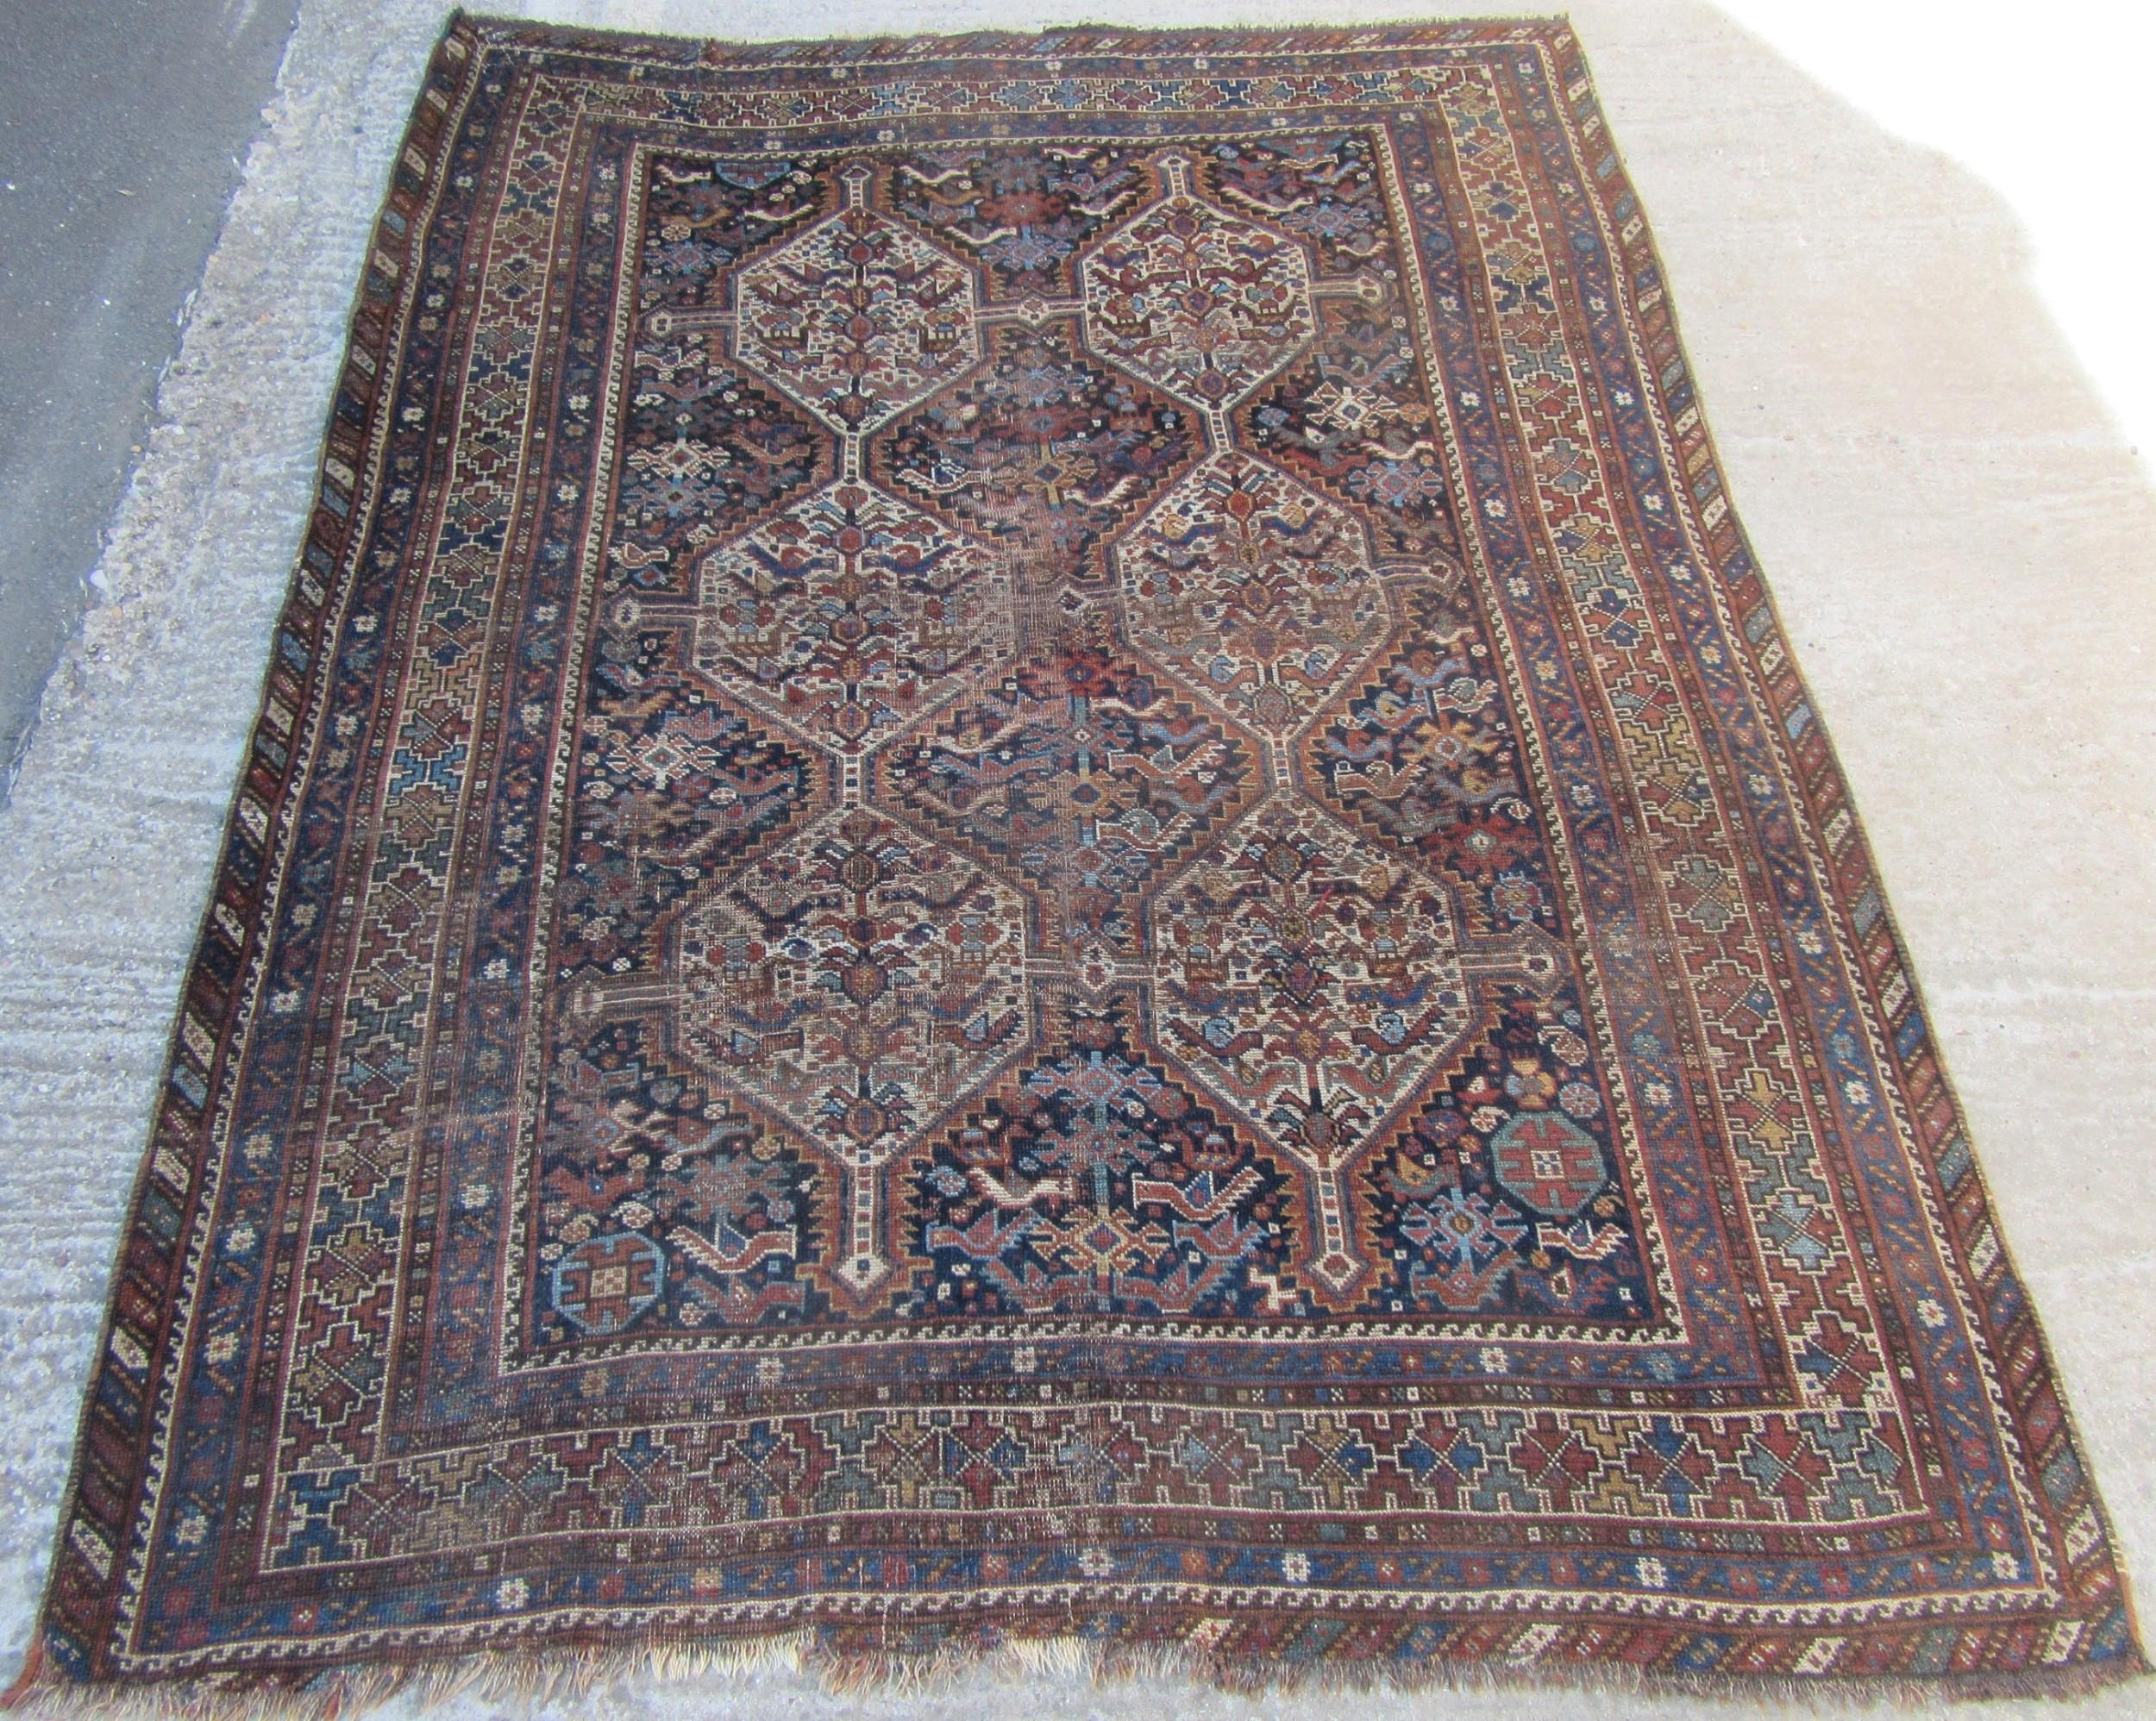 a morghi tribal rug by the baharlu taifeh of the khamseh confederacy fars south west persian khamseh rug